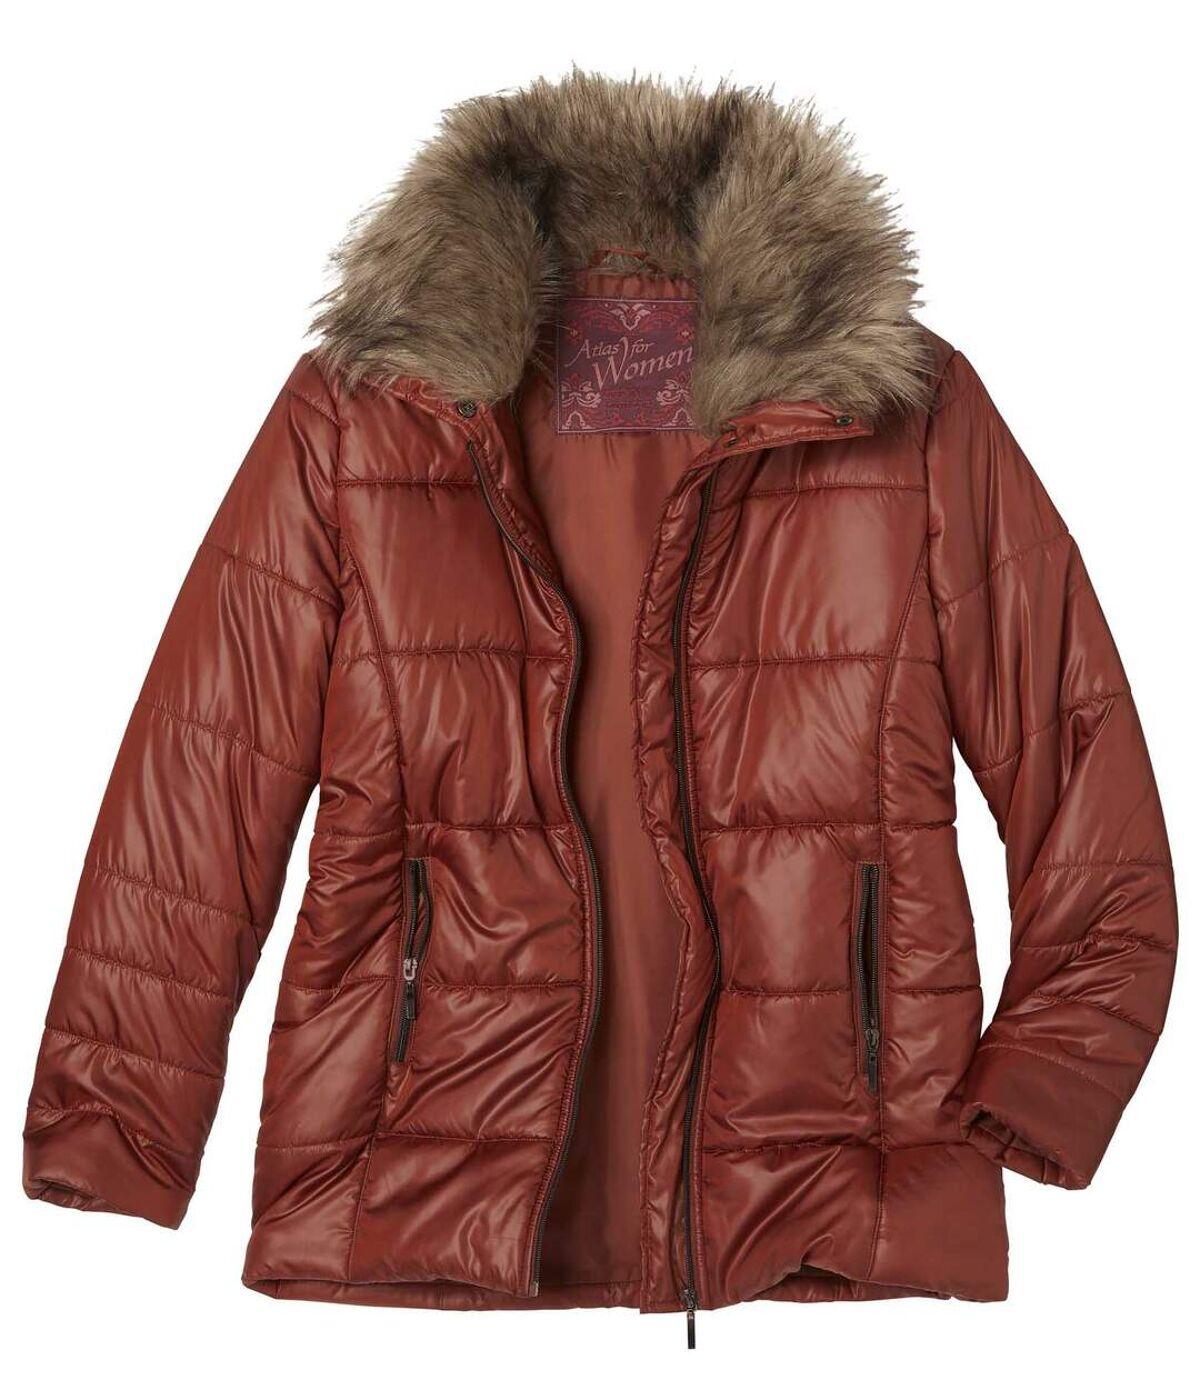 Women's Terracotta Padded Jacket with Faux Fur Collar Atlas For Men